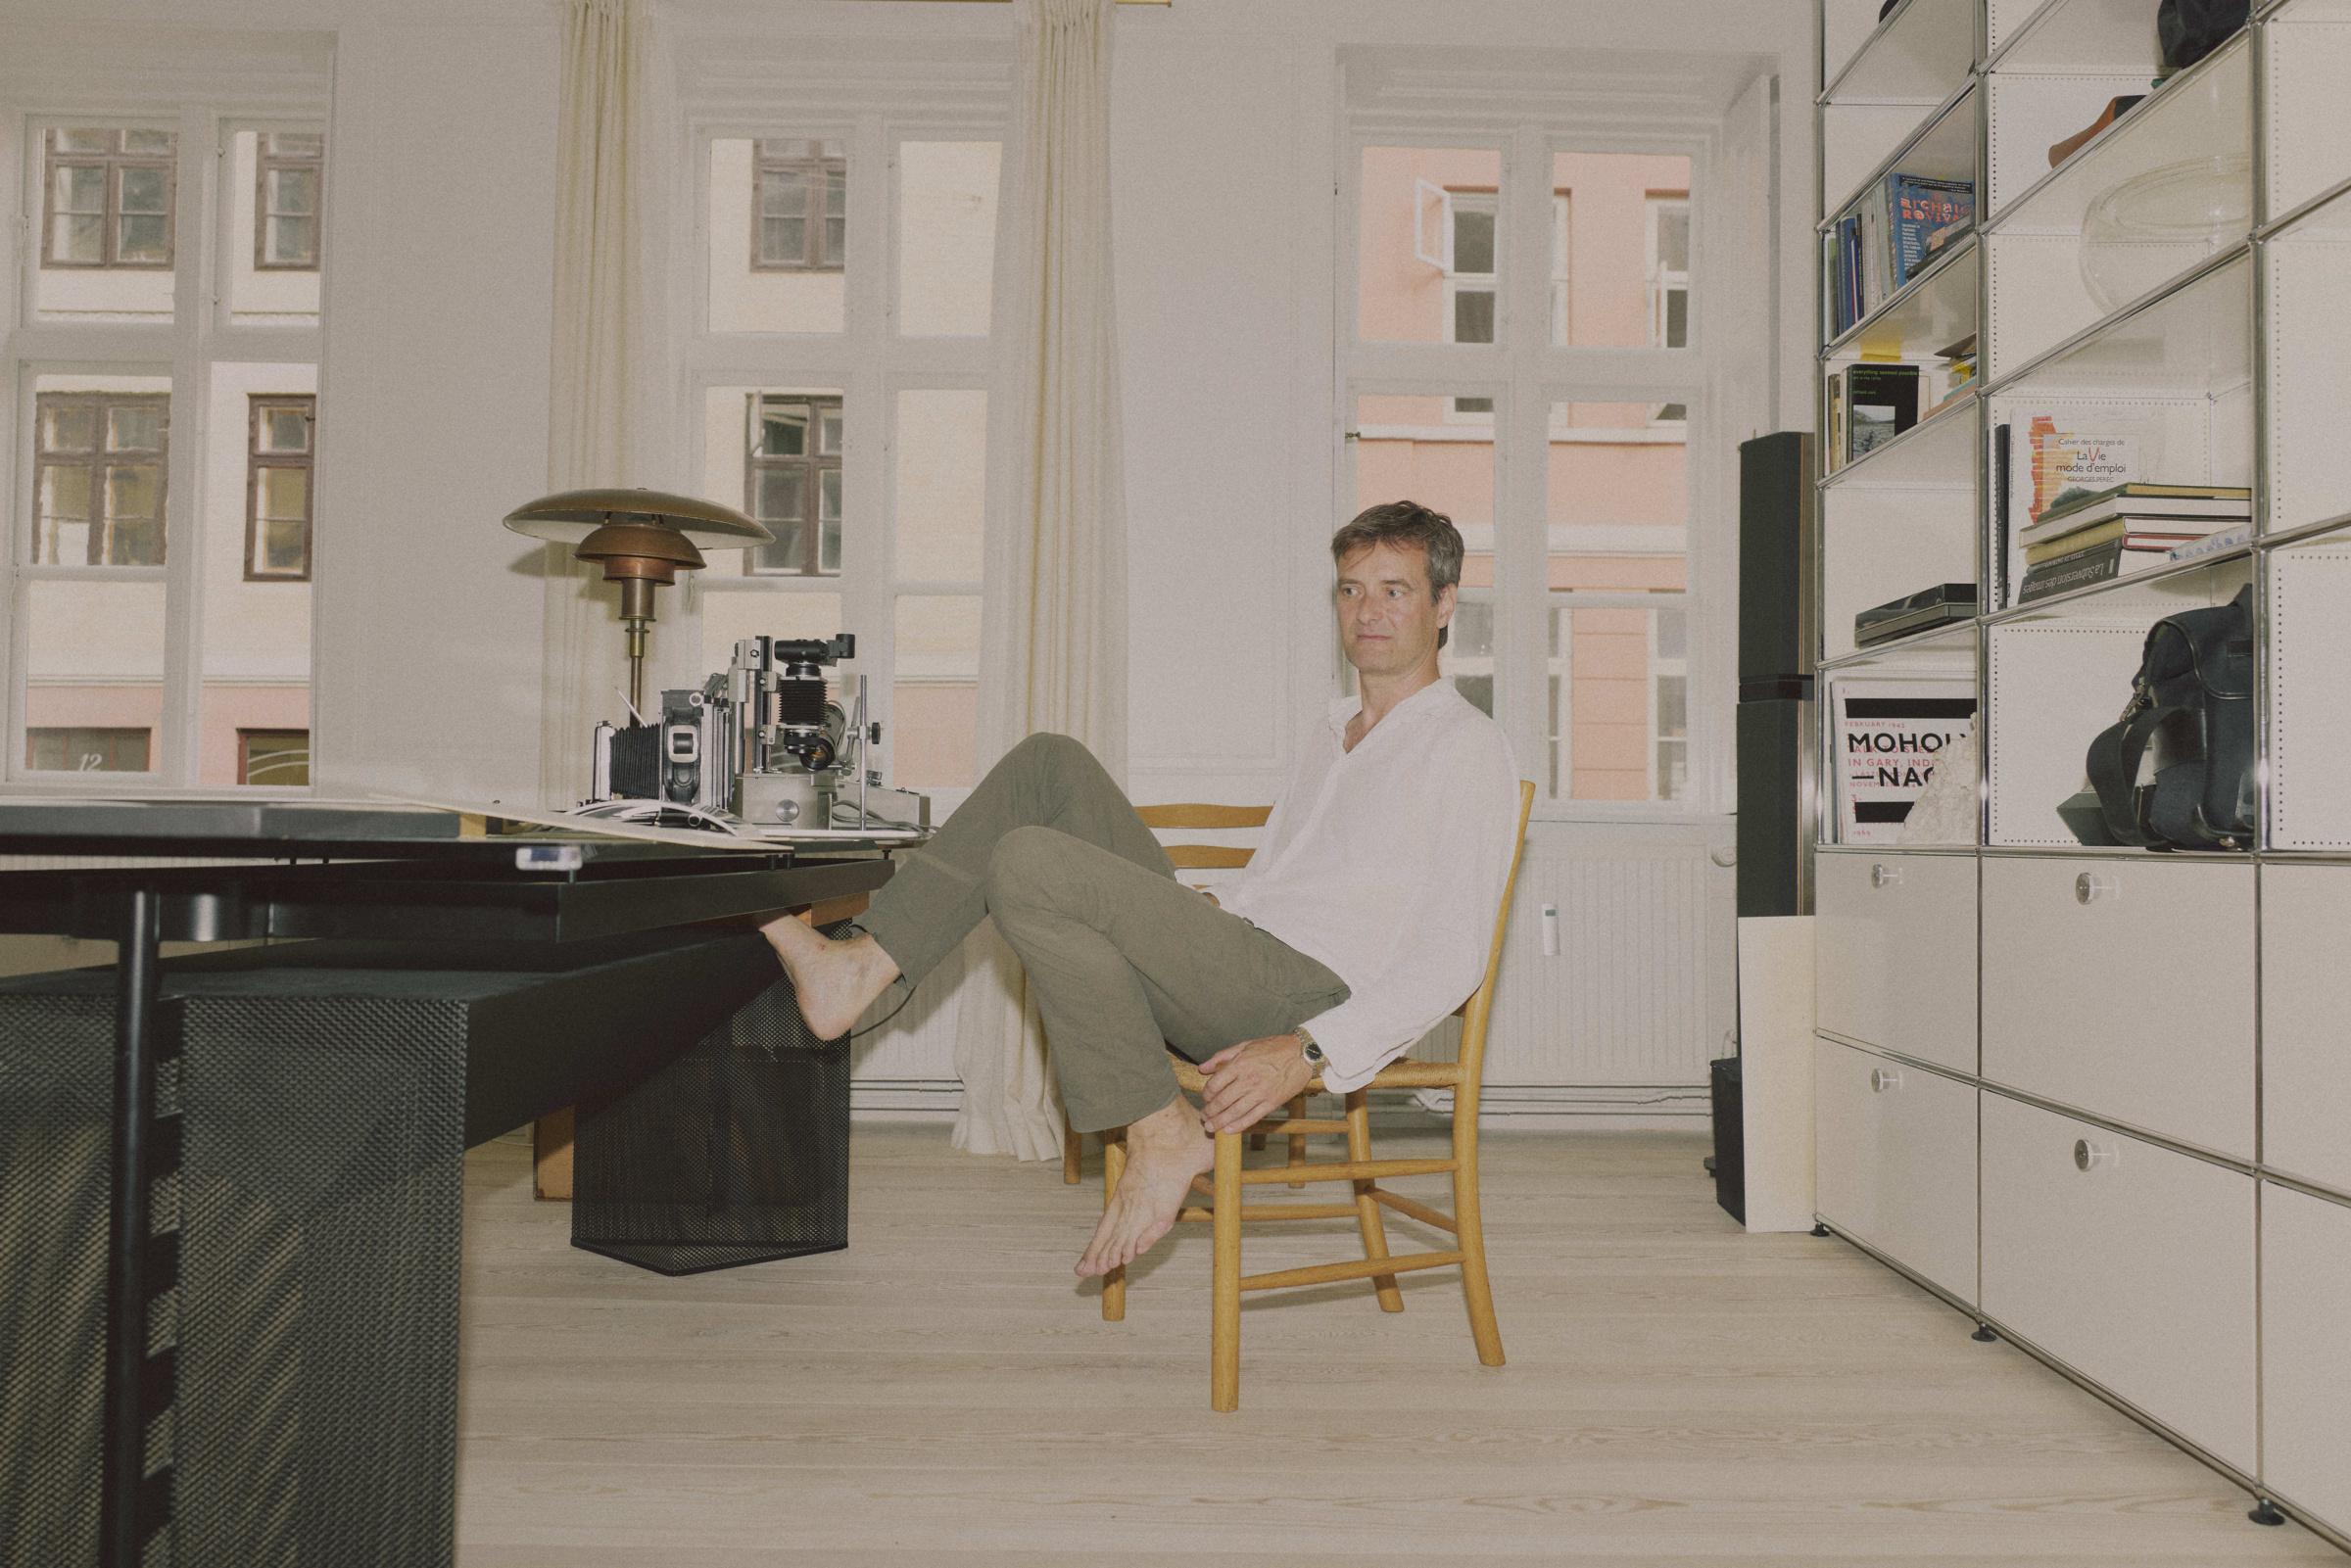 <p>Kunstner Ulrik Heltoft i sit hjem i Studiestræde. Foto: Jonas Pryner Andersen</p> Foto: